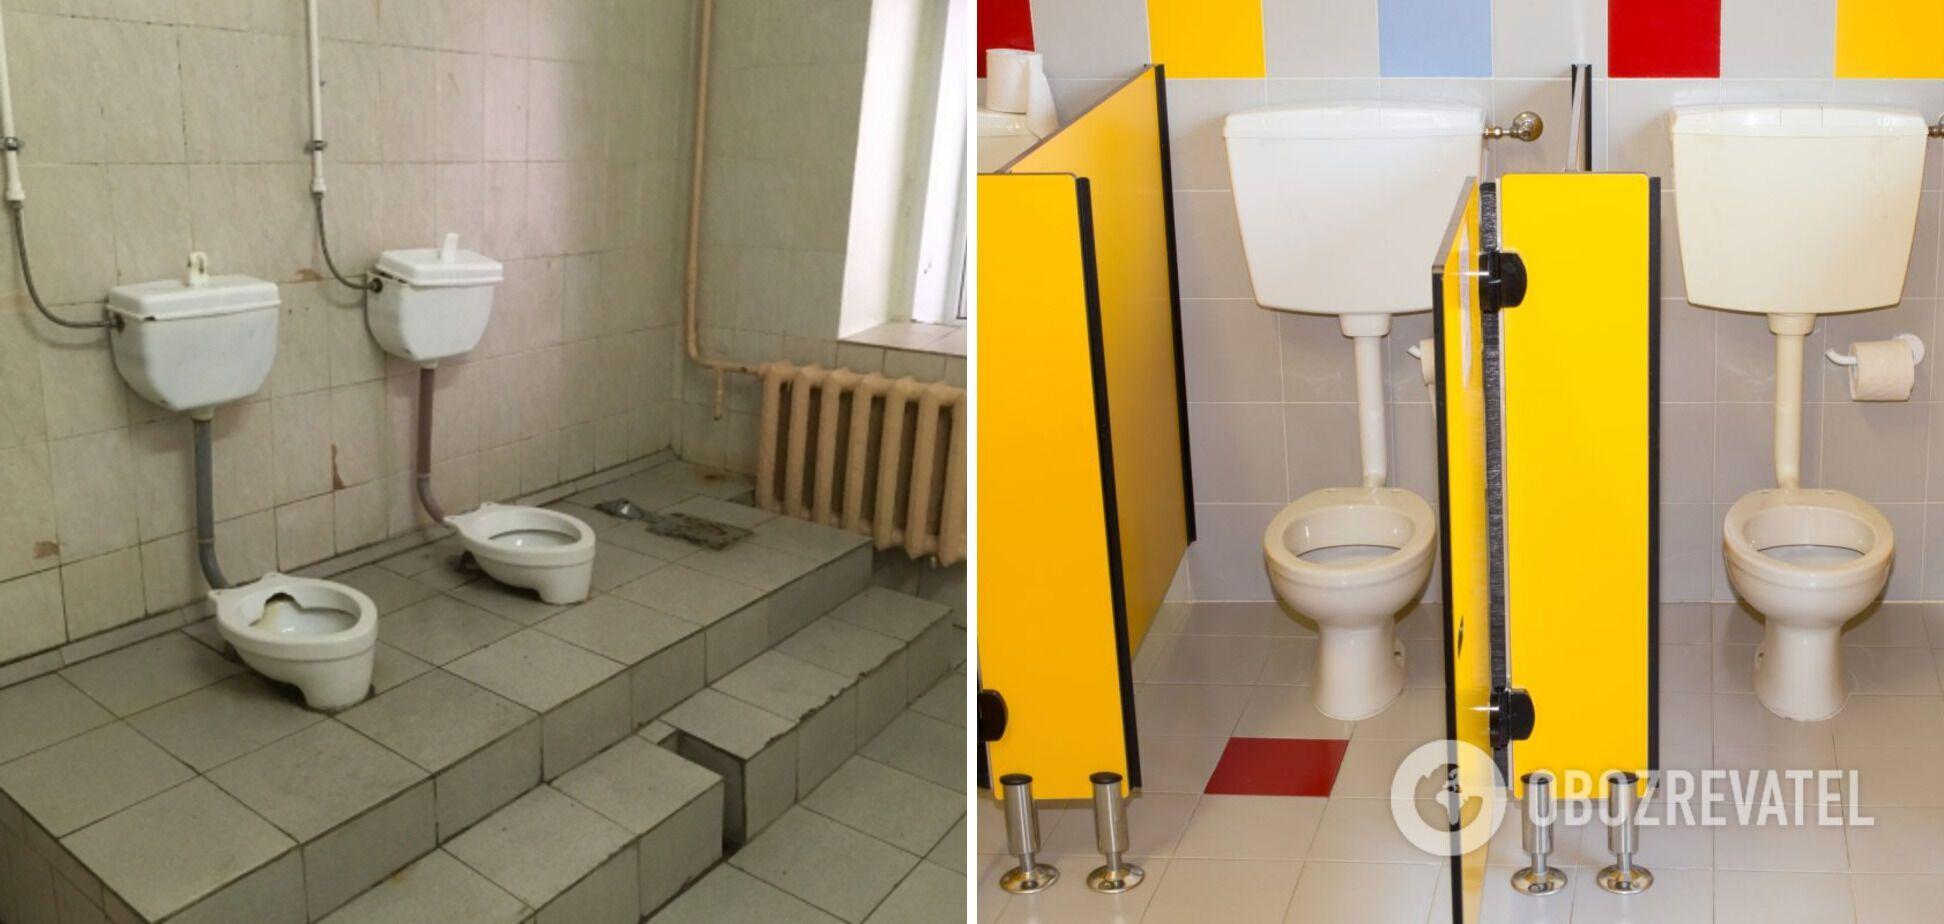 Раніше в туалетах не було кабінок і дверей